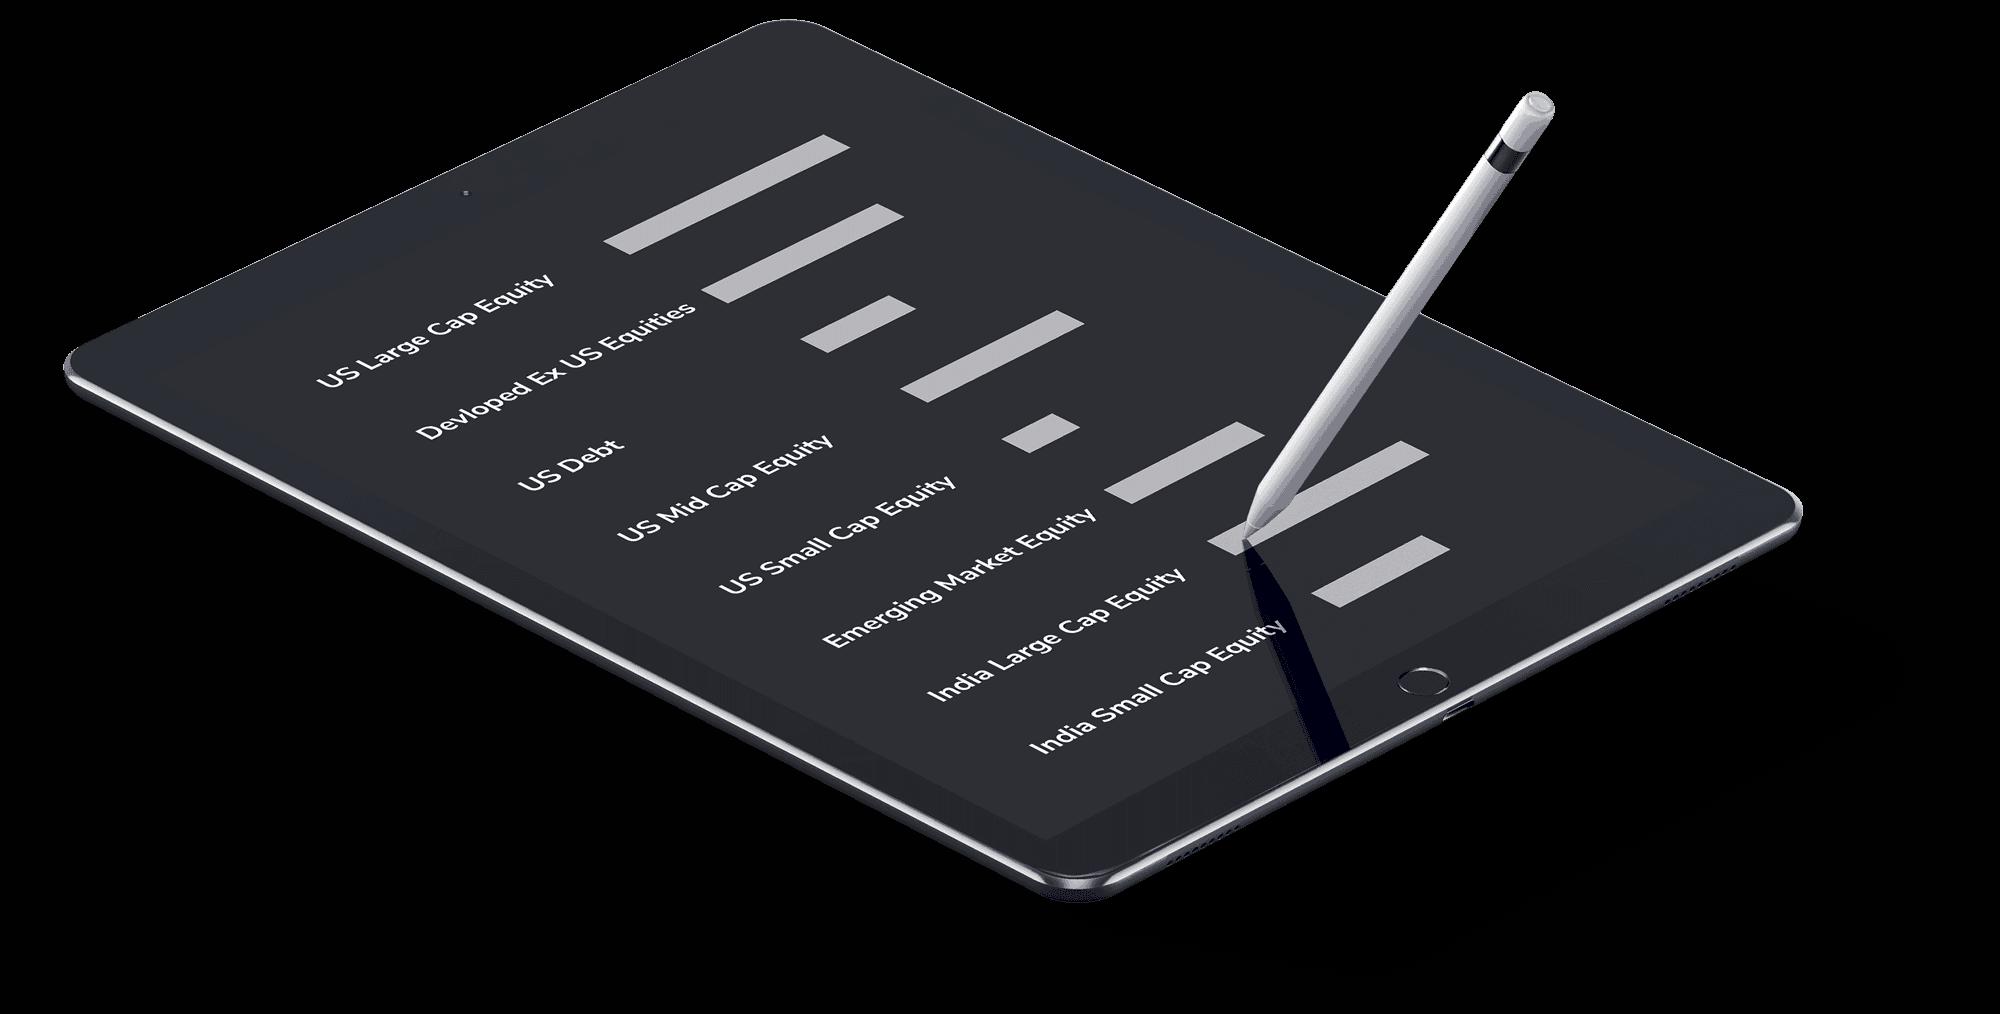 2. Hemista will recommend portfolio options